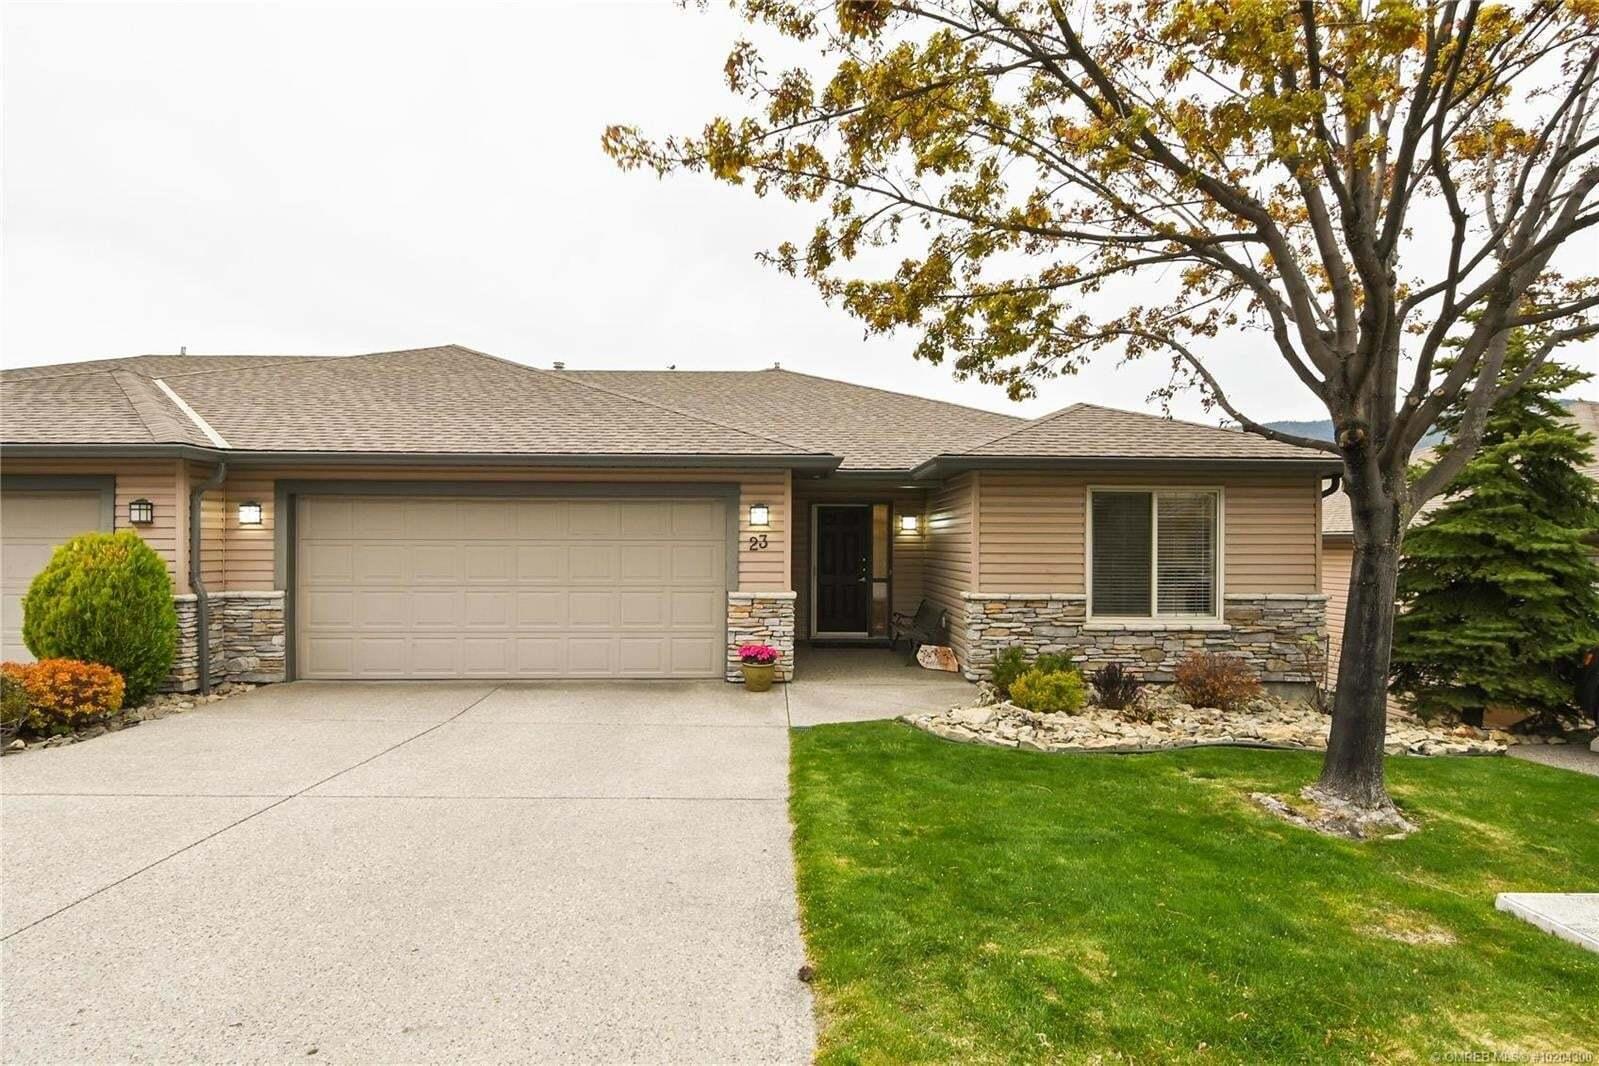 Townhouse for sale at 3512 Ridge Blvd West Kelowna British Columbia - MLS: 10204300